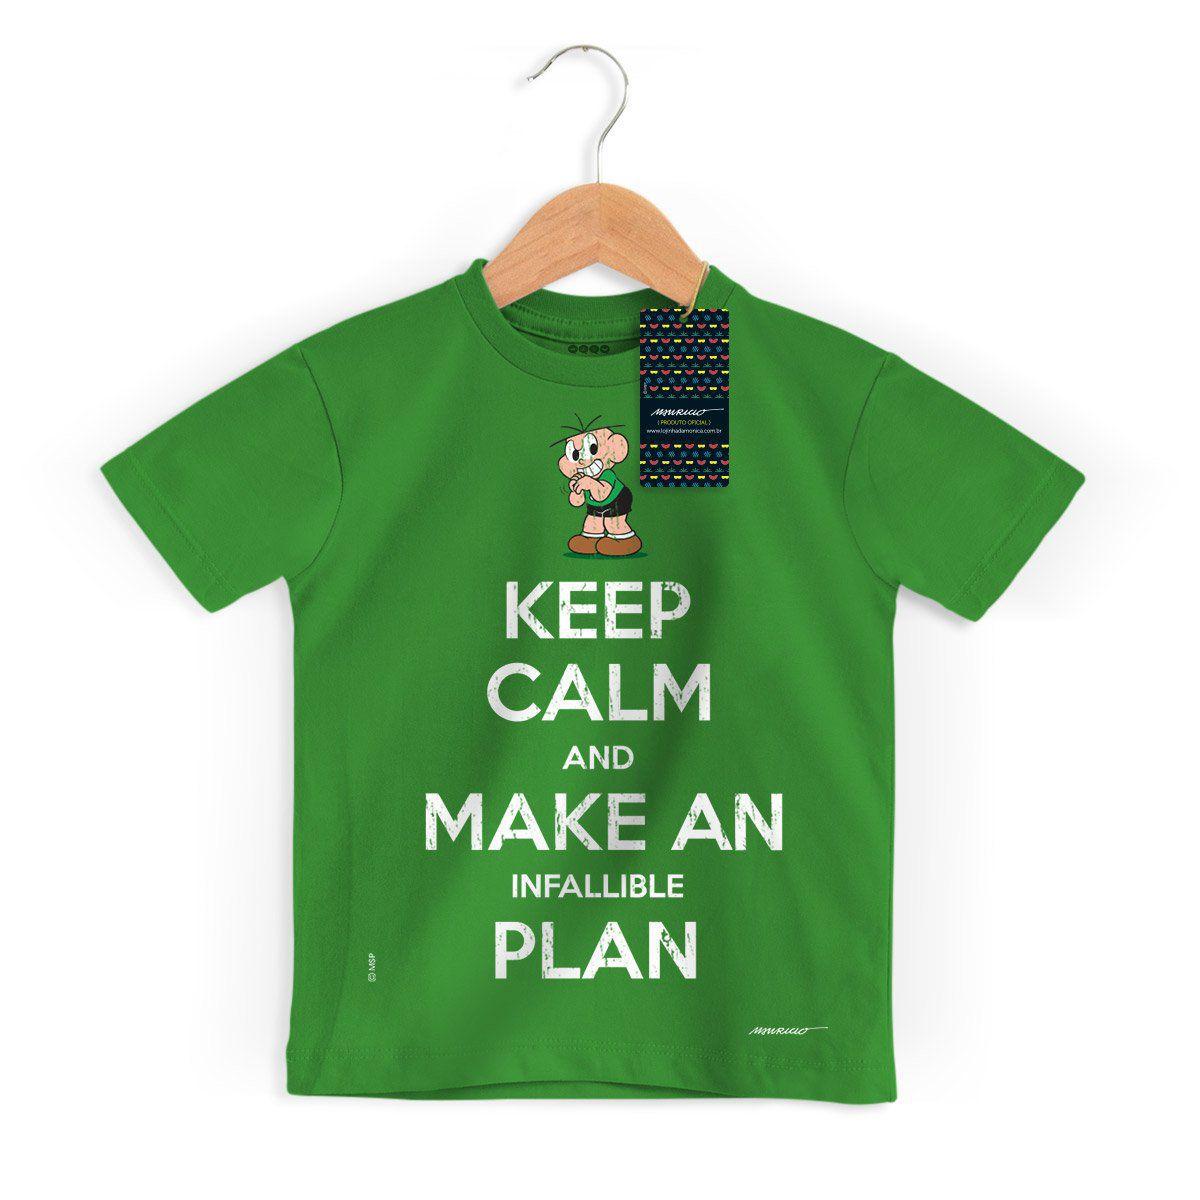 Camiseta Infantil Turma Da Mônica Cool Keep Calm And Make Infallible Plan